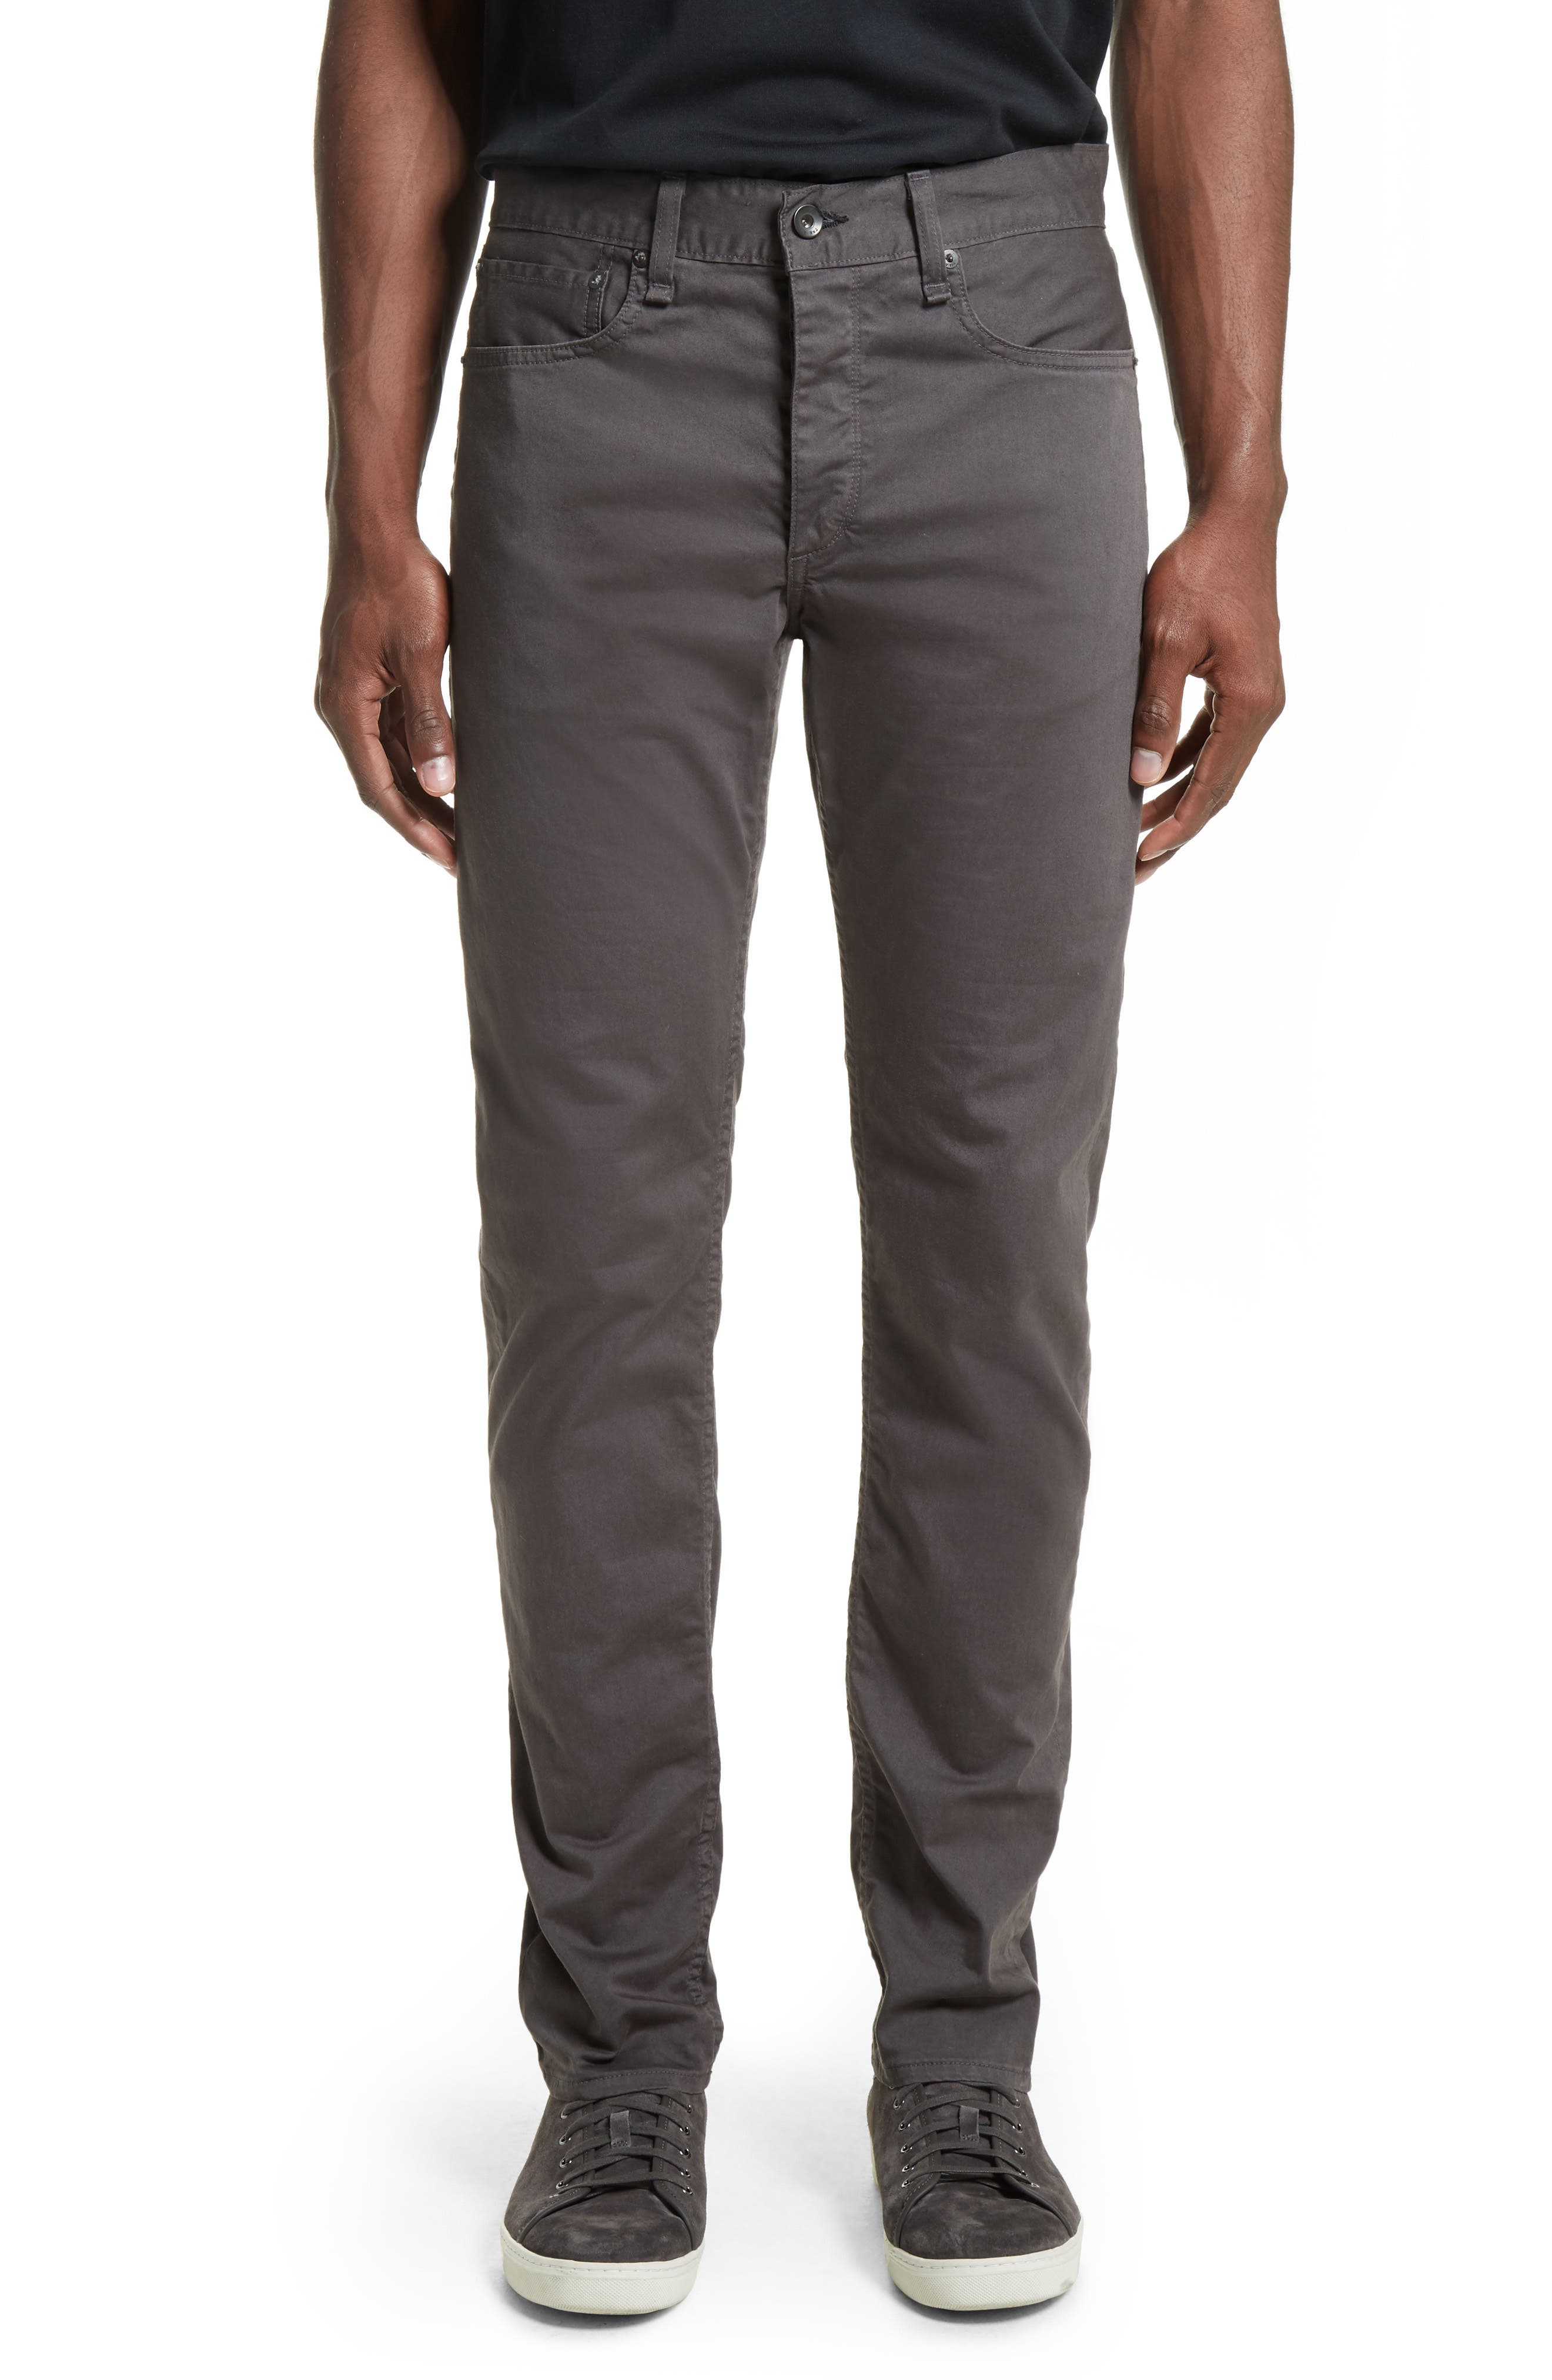 Alternate Image 1 Selected - rag & bone Fit 2 Slim Five-Pocket Pants